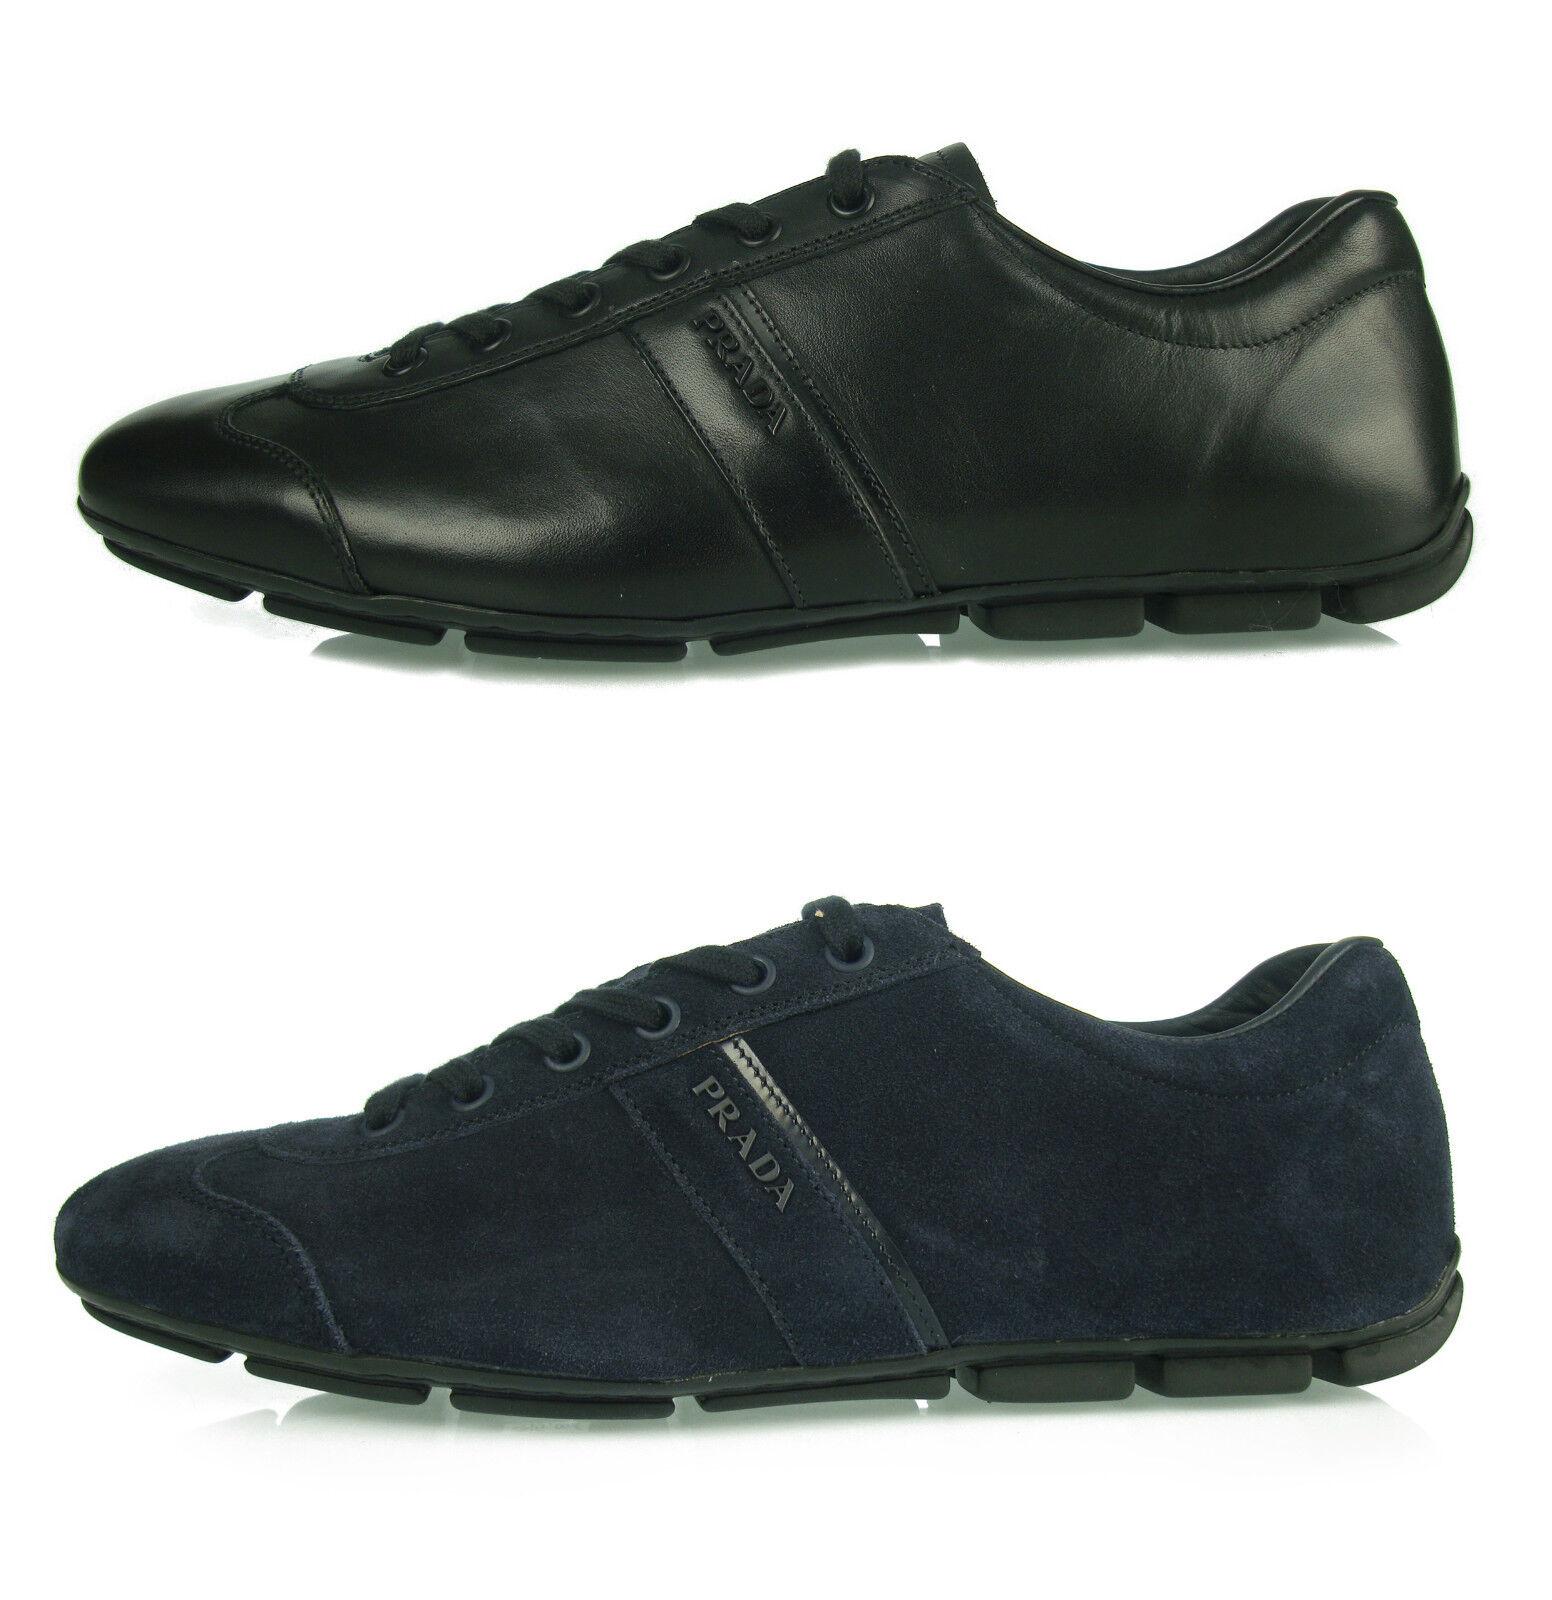 C1 495 PRADA sneakers Zapatos MONTECARLO hombre Zapatos MAN Zapatos sneakers herrenshuhe s 100%AUT. 2474ed